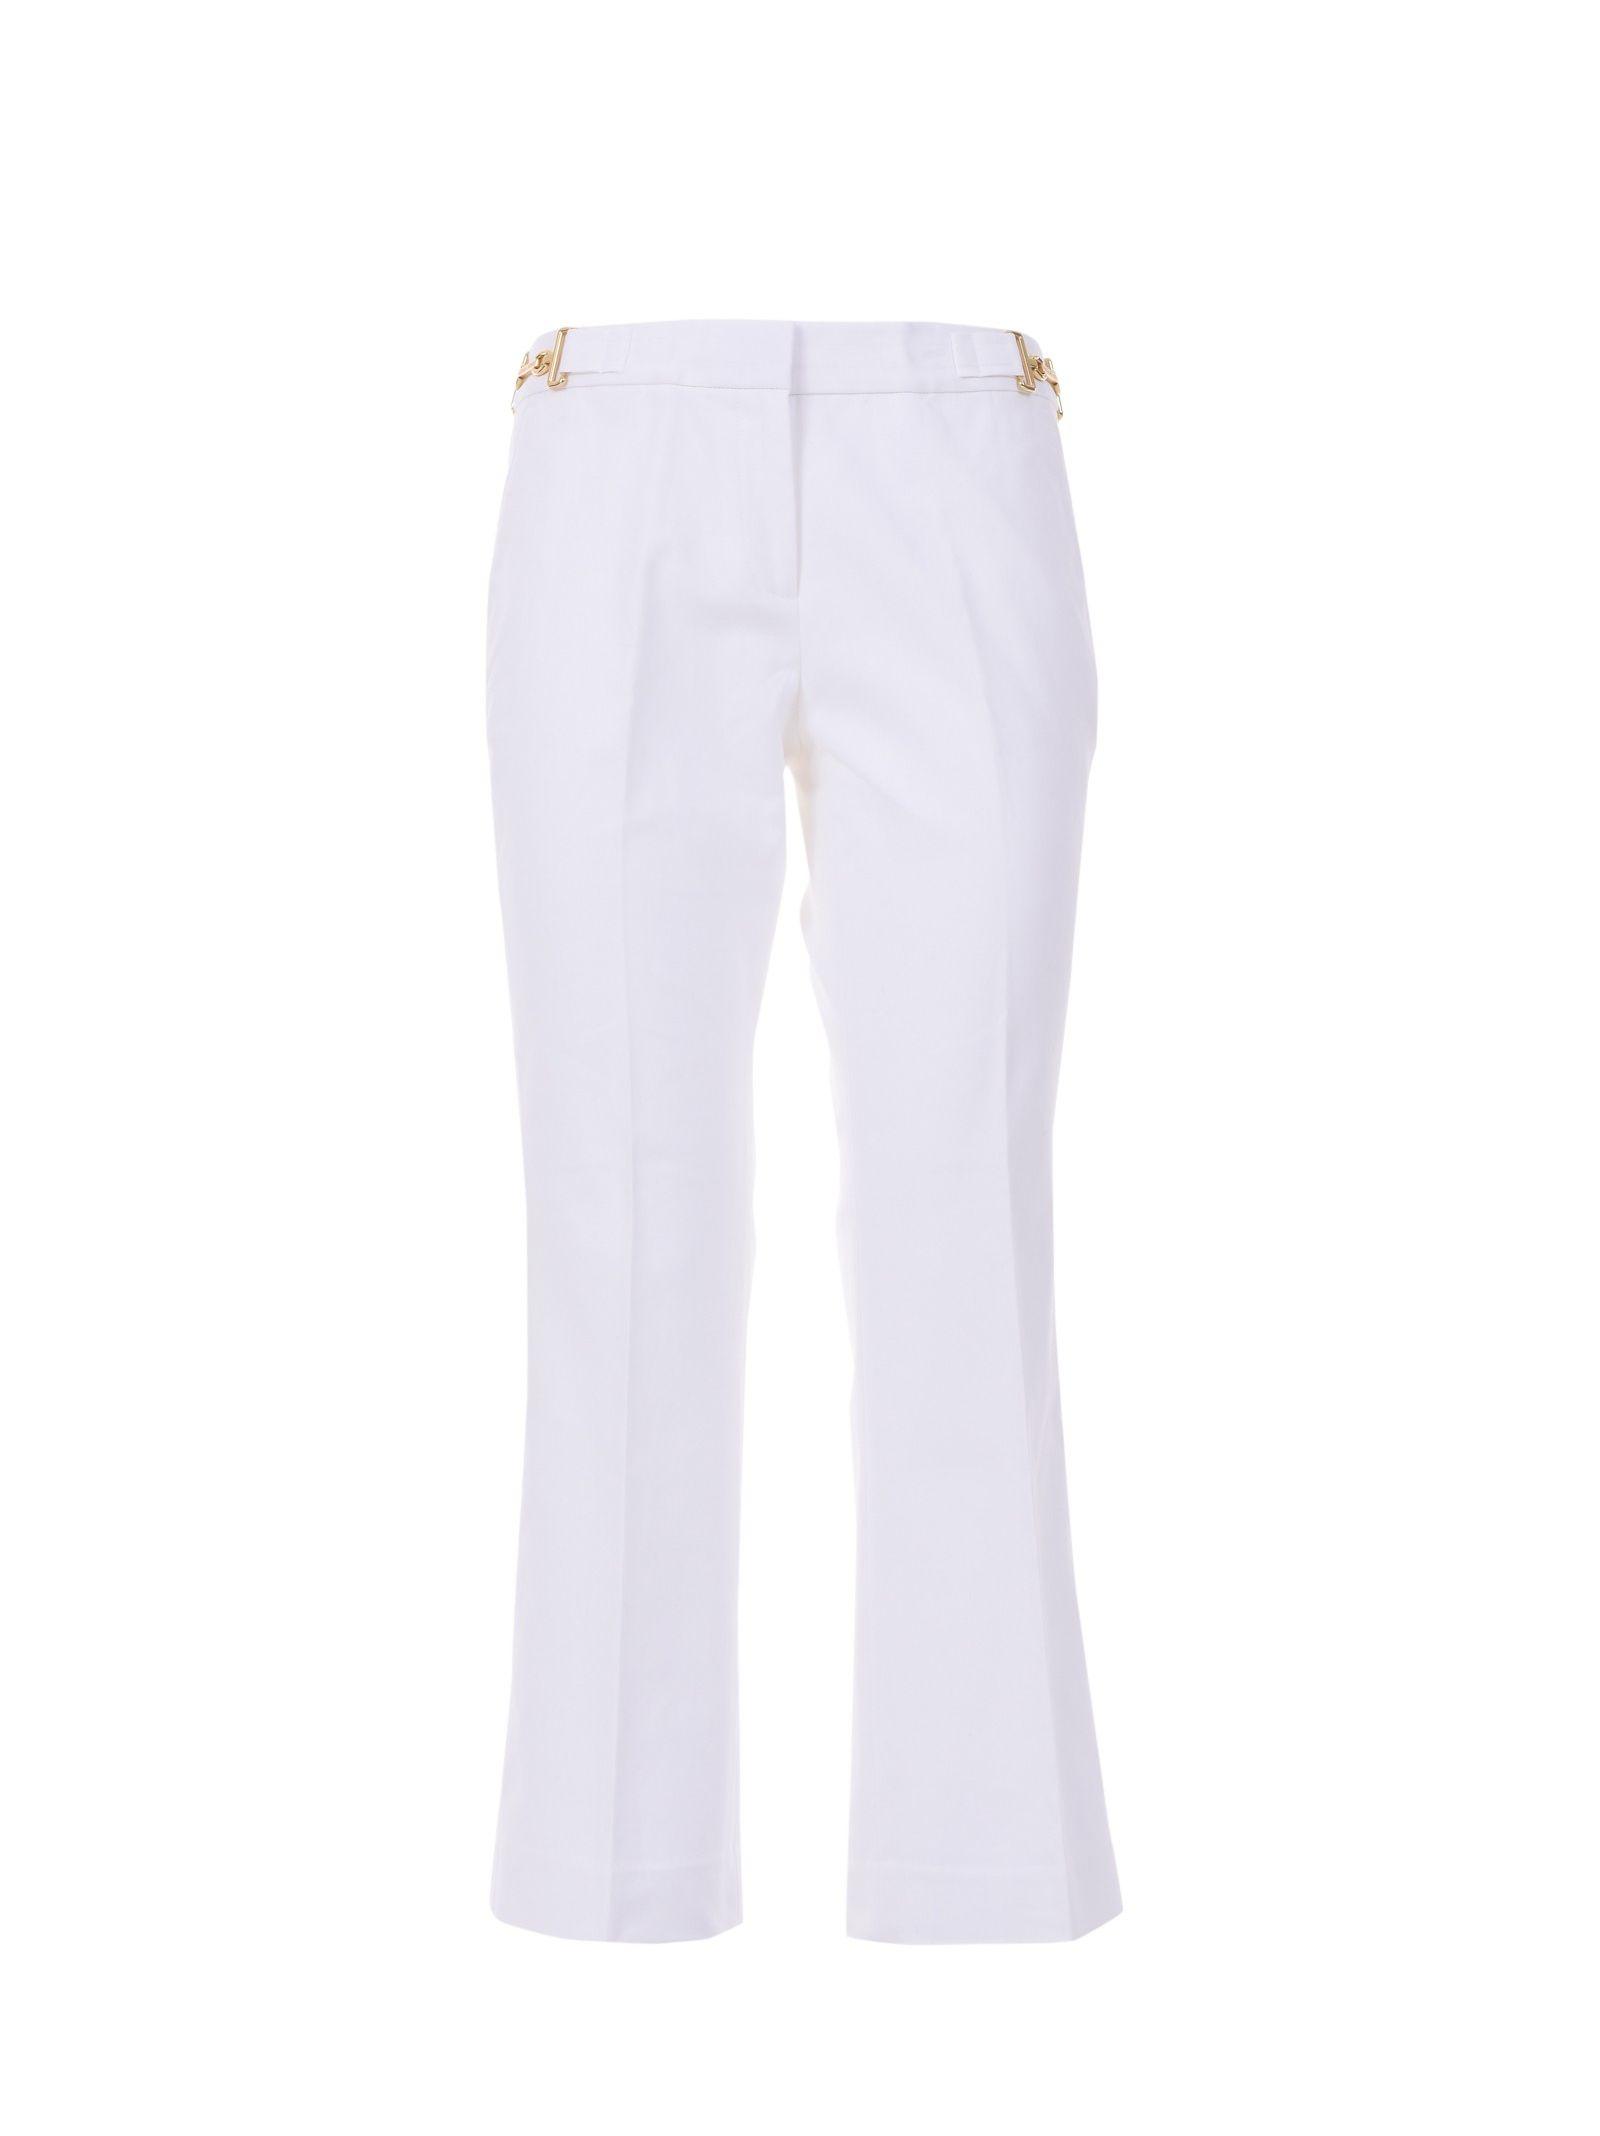 Pantaloni de damă MICHAEL KORS